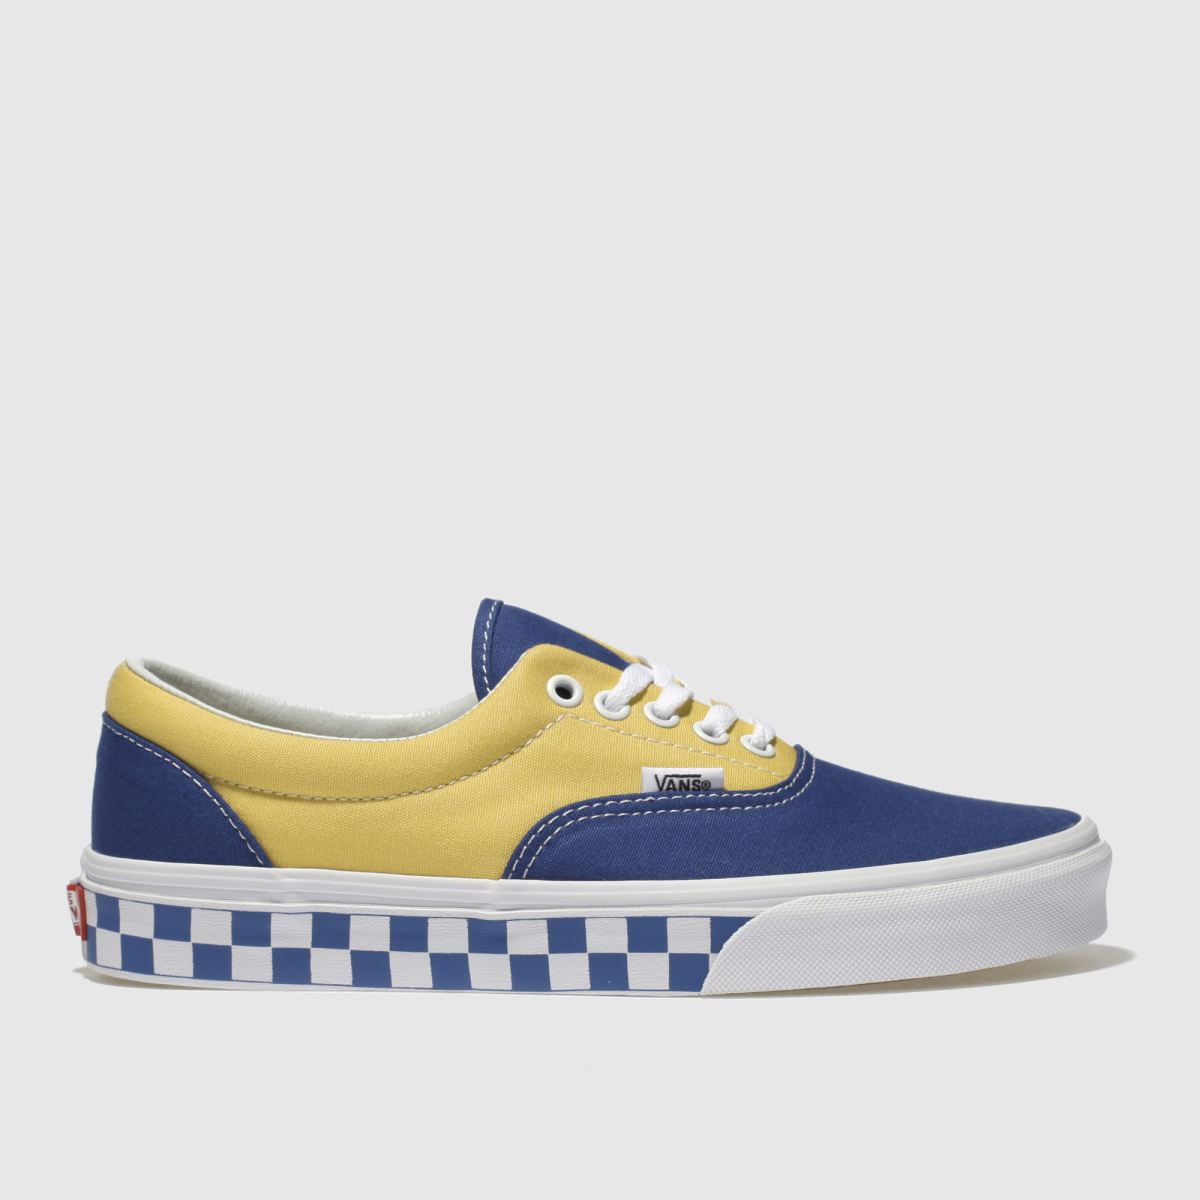 Vans Blue & Yellow Era Trainers